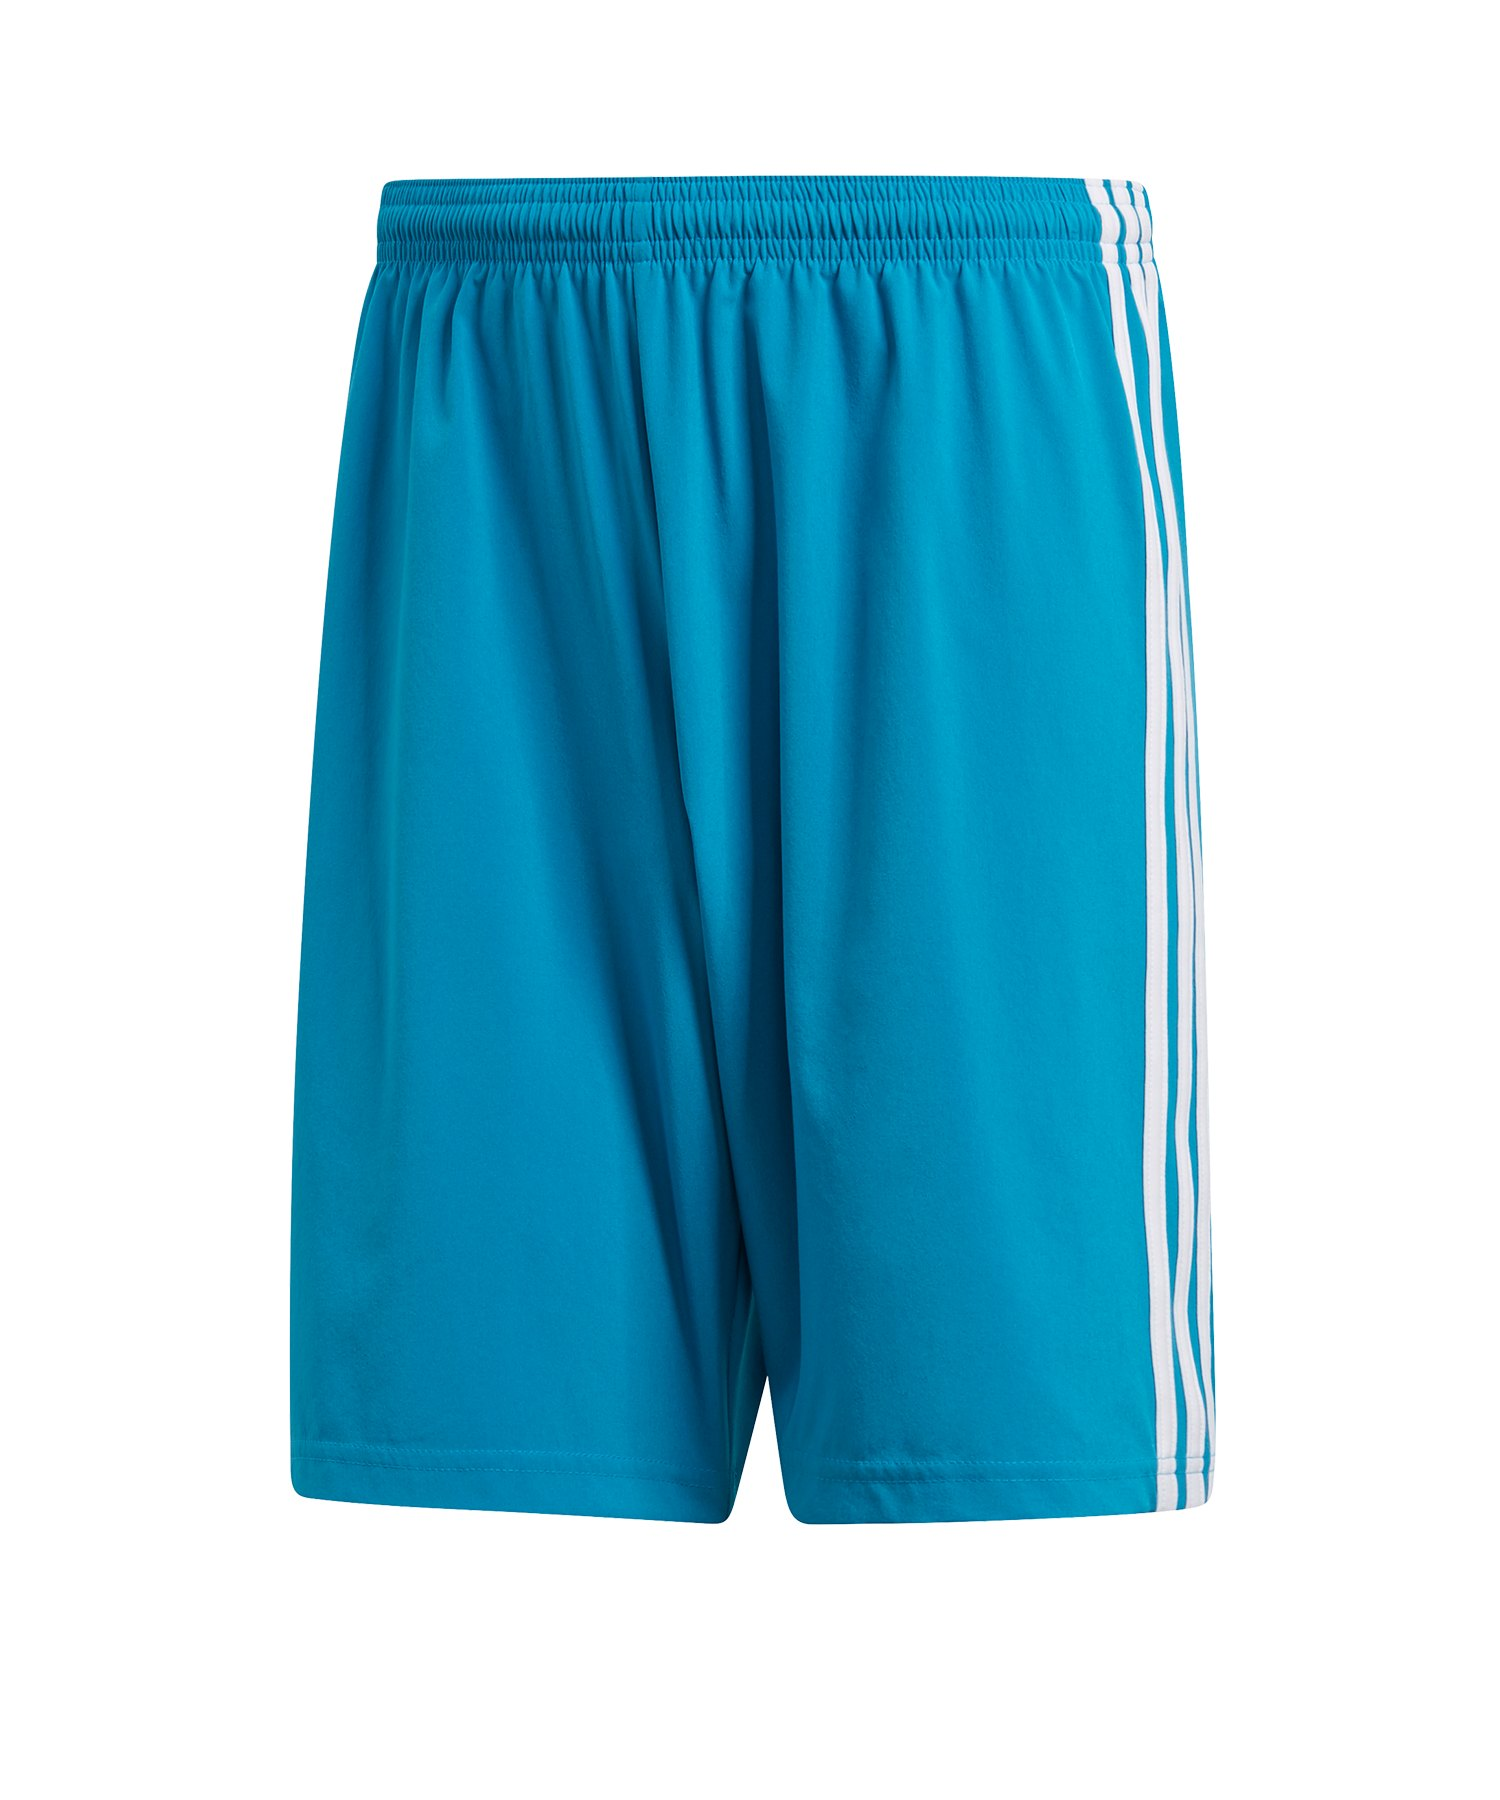 adidas Condivo 18 Short Hose kurz Kids Blau - blau